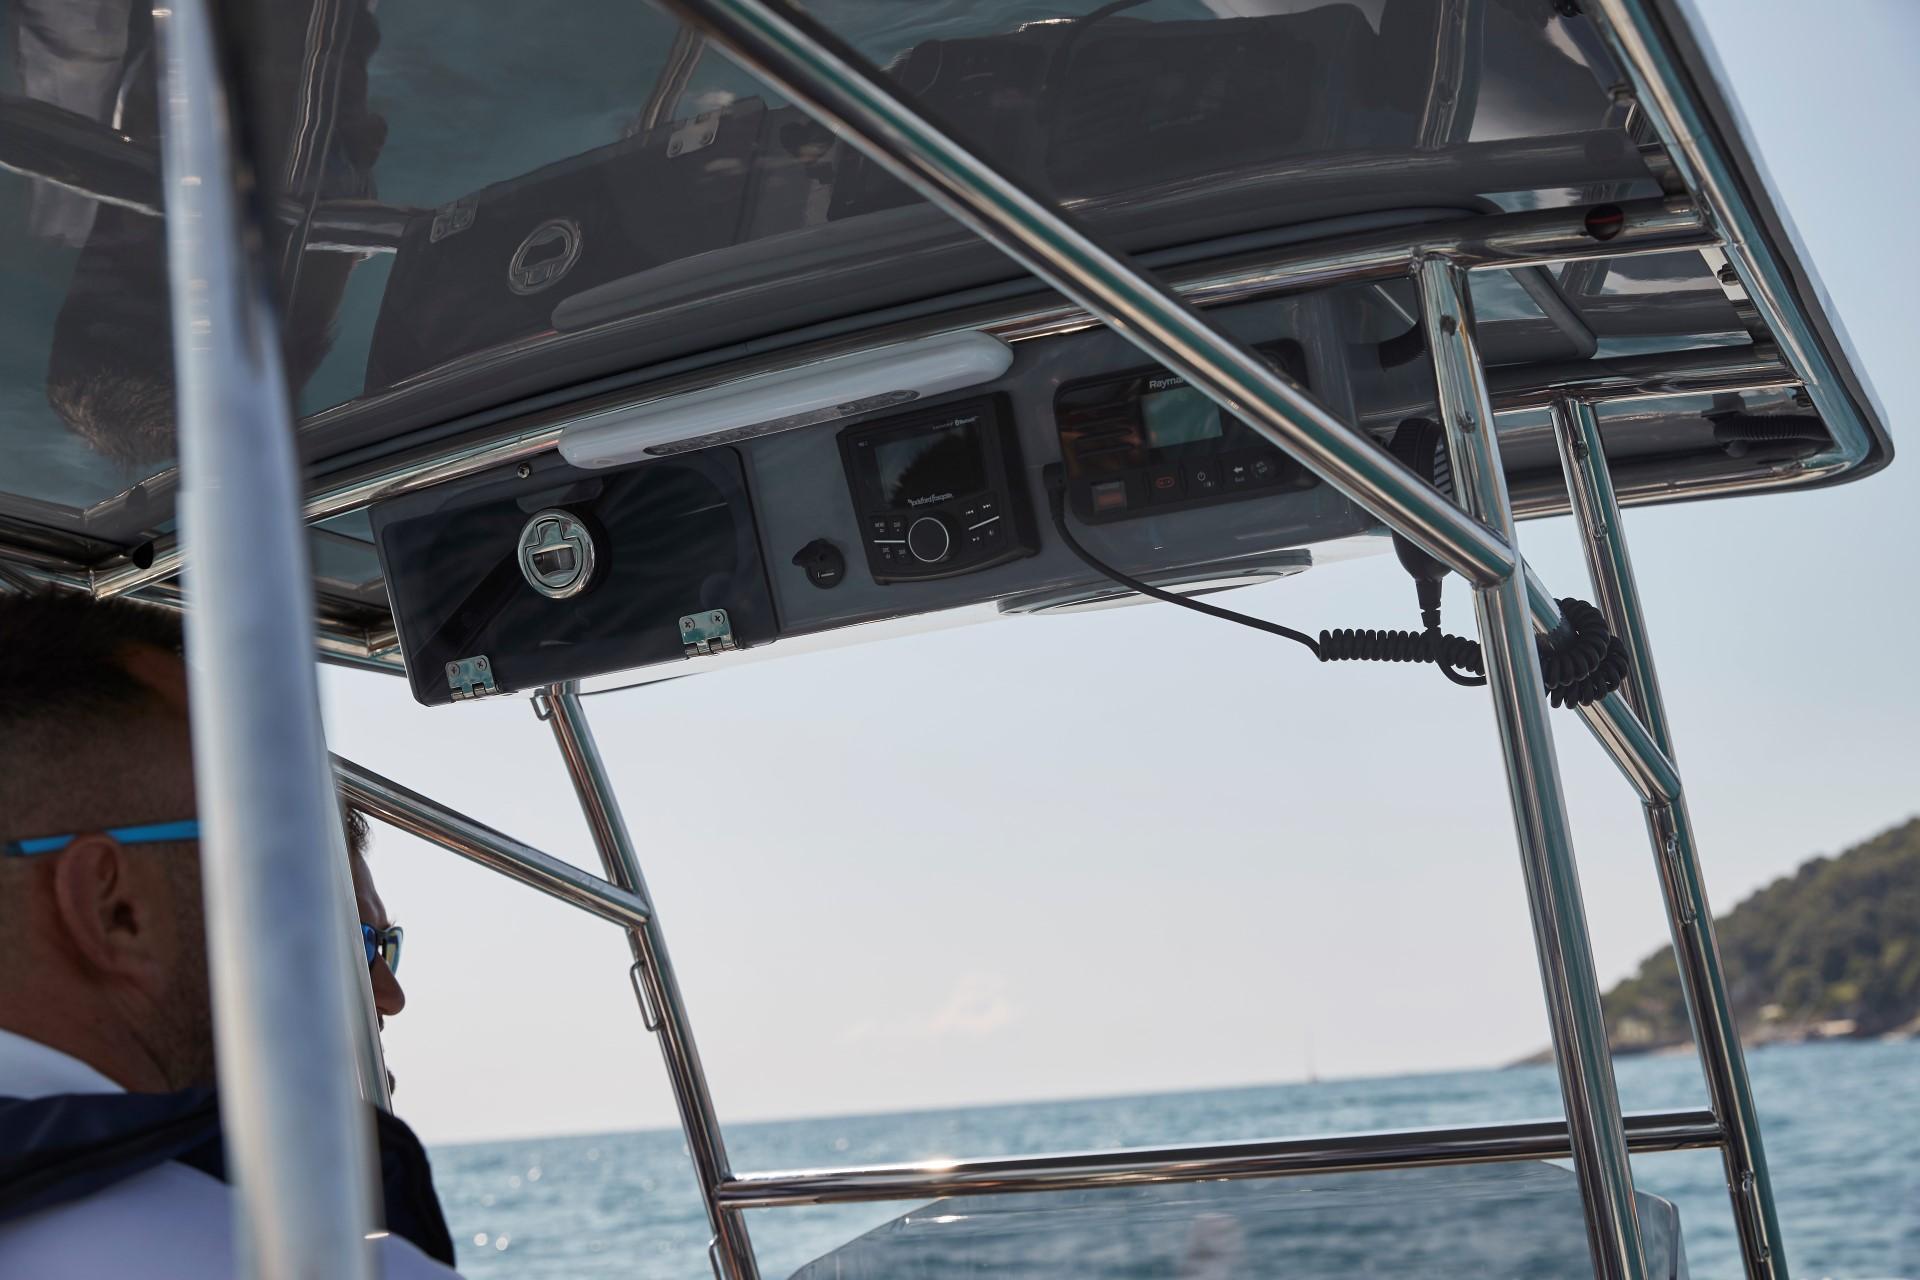 Joker Boat Barracuda t top details